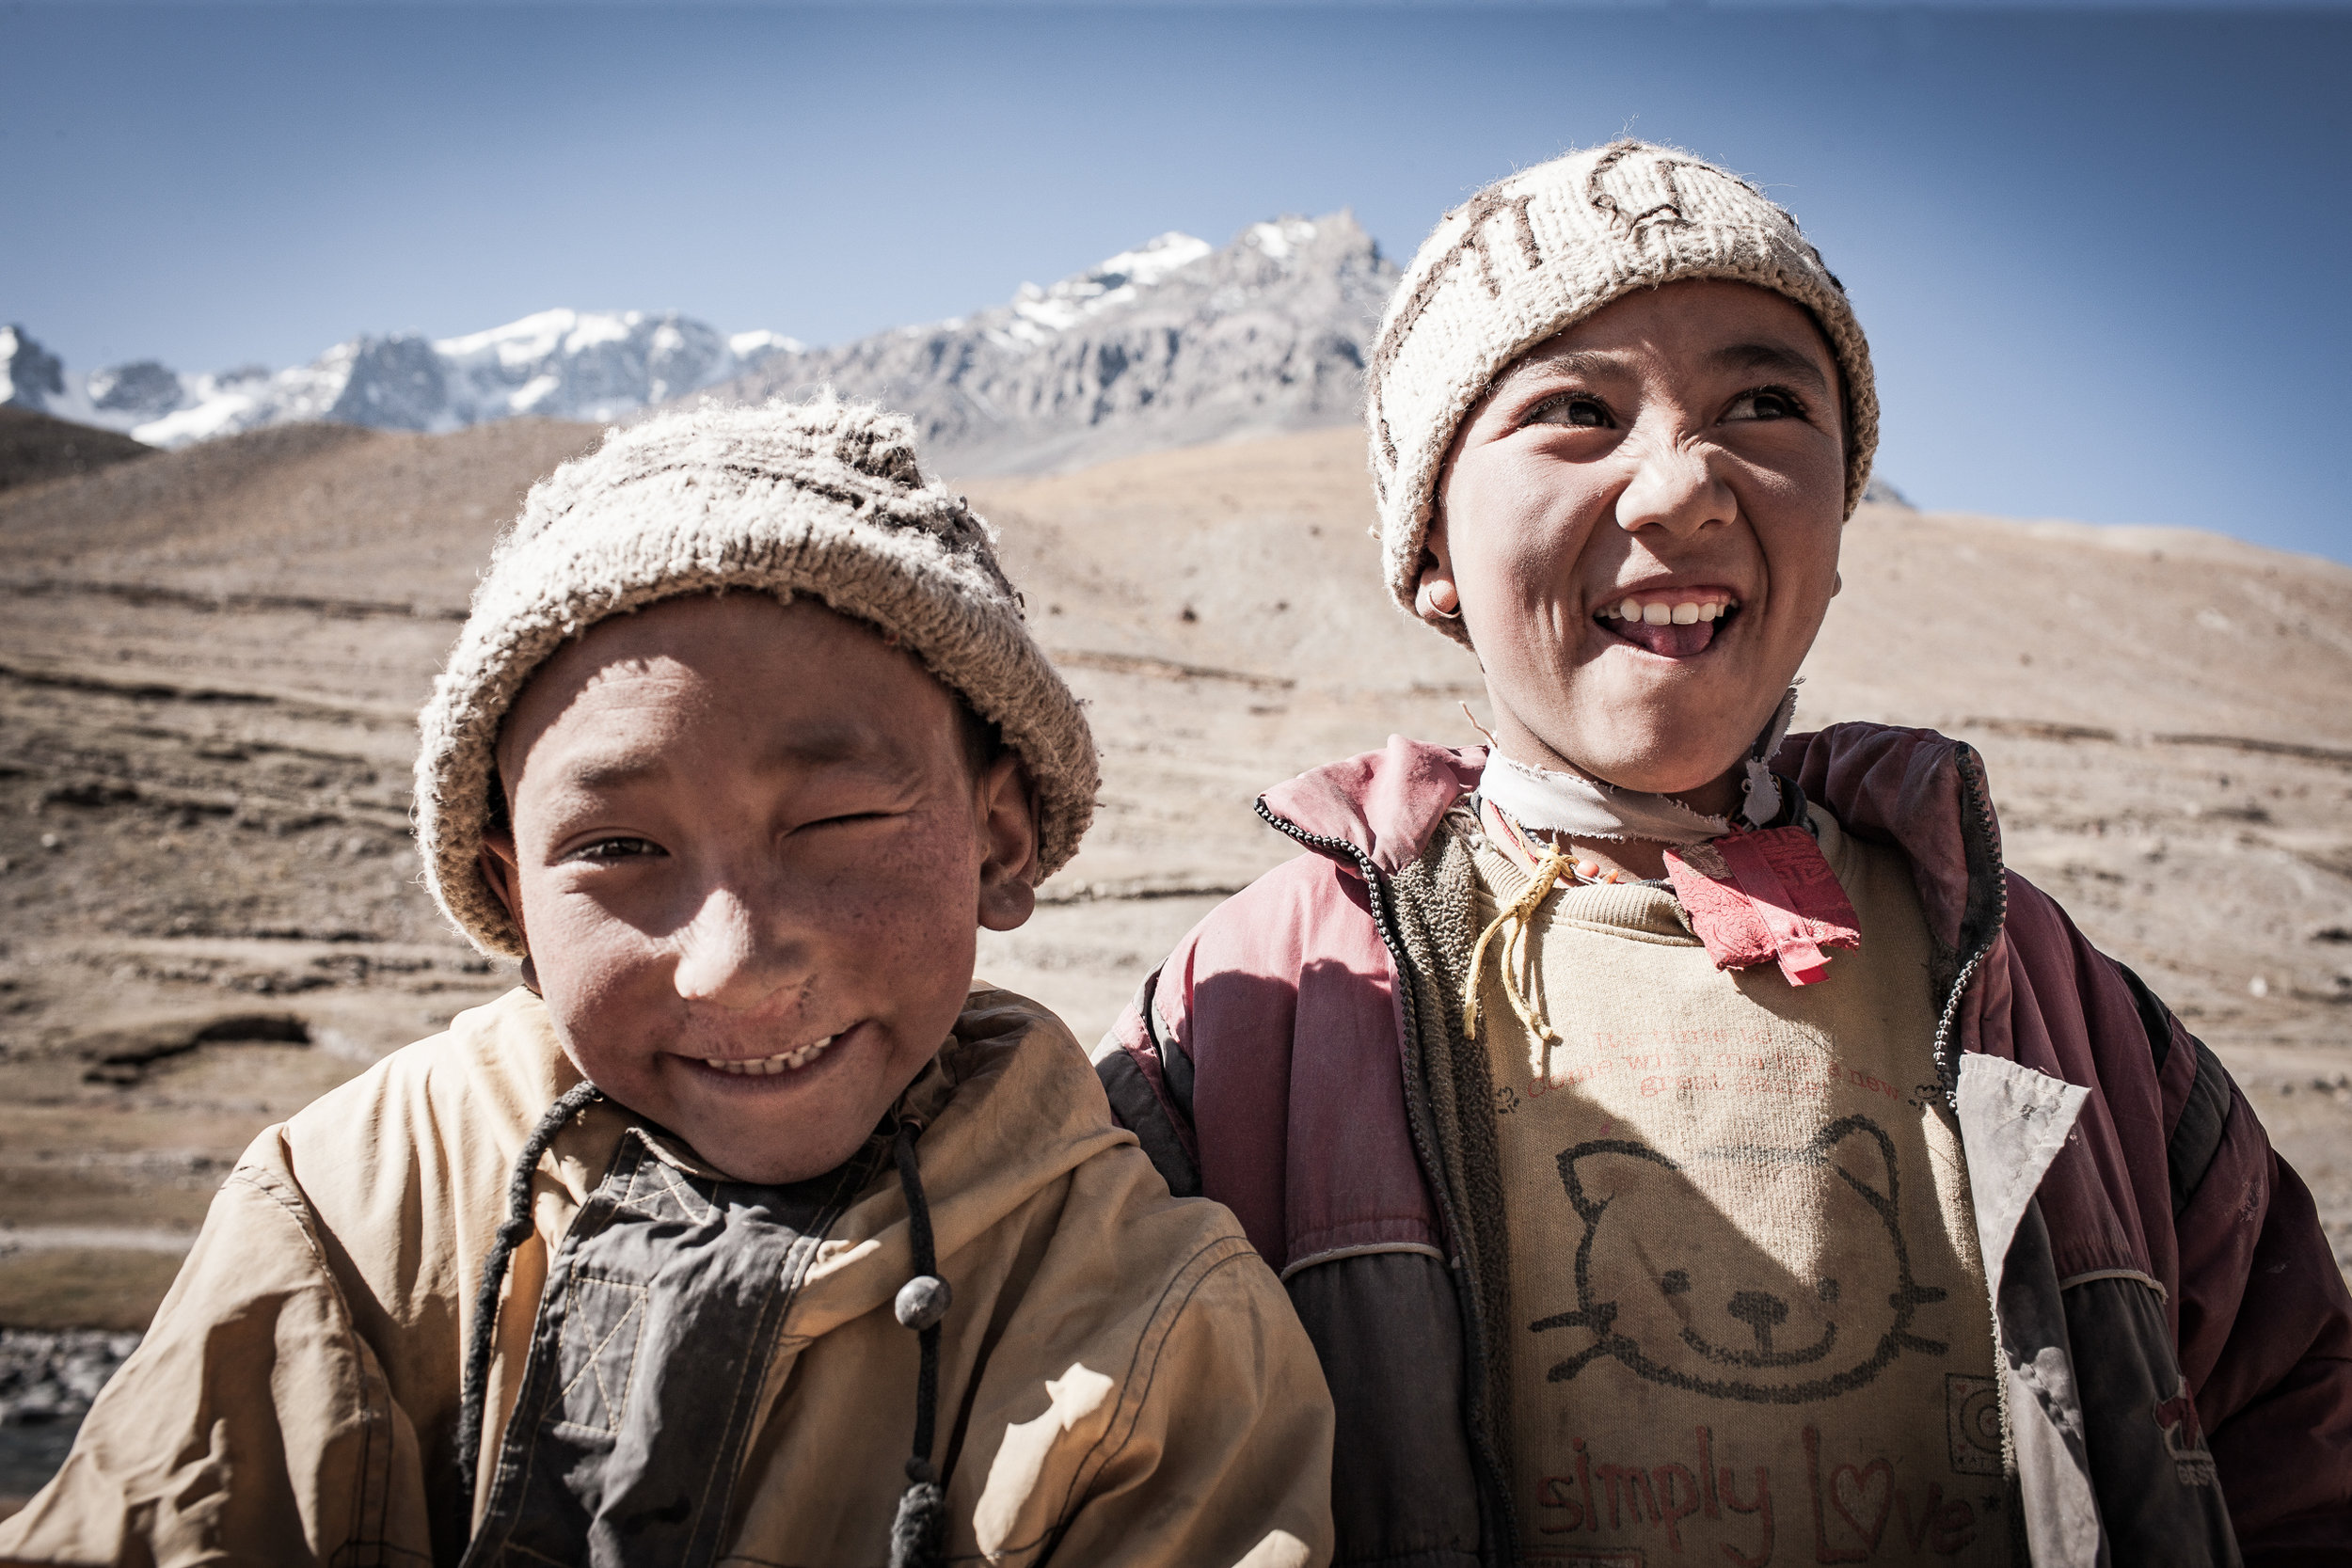 Gaudenz Danuser, Photoskar, Ladakh India